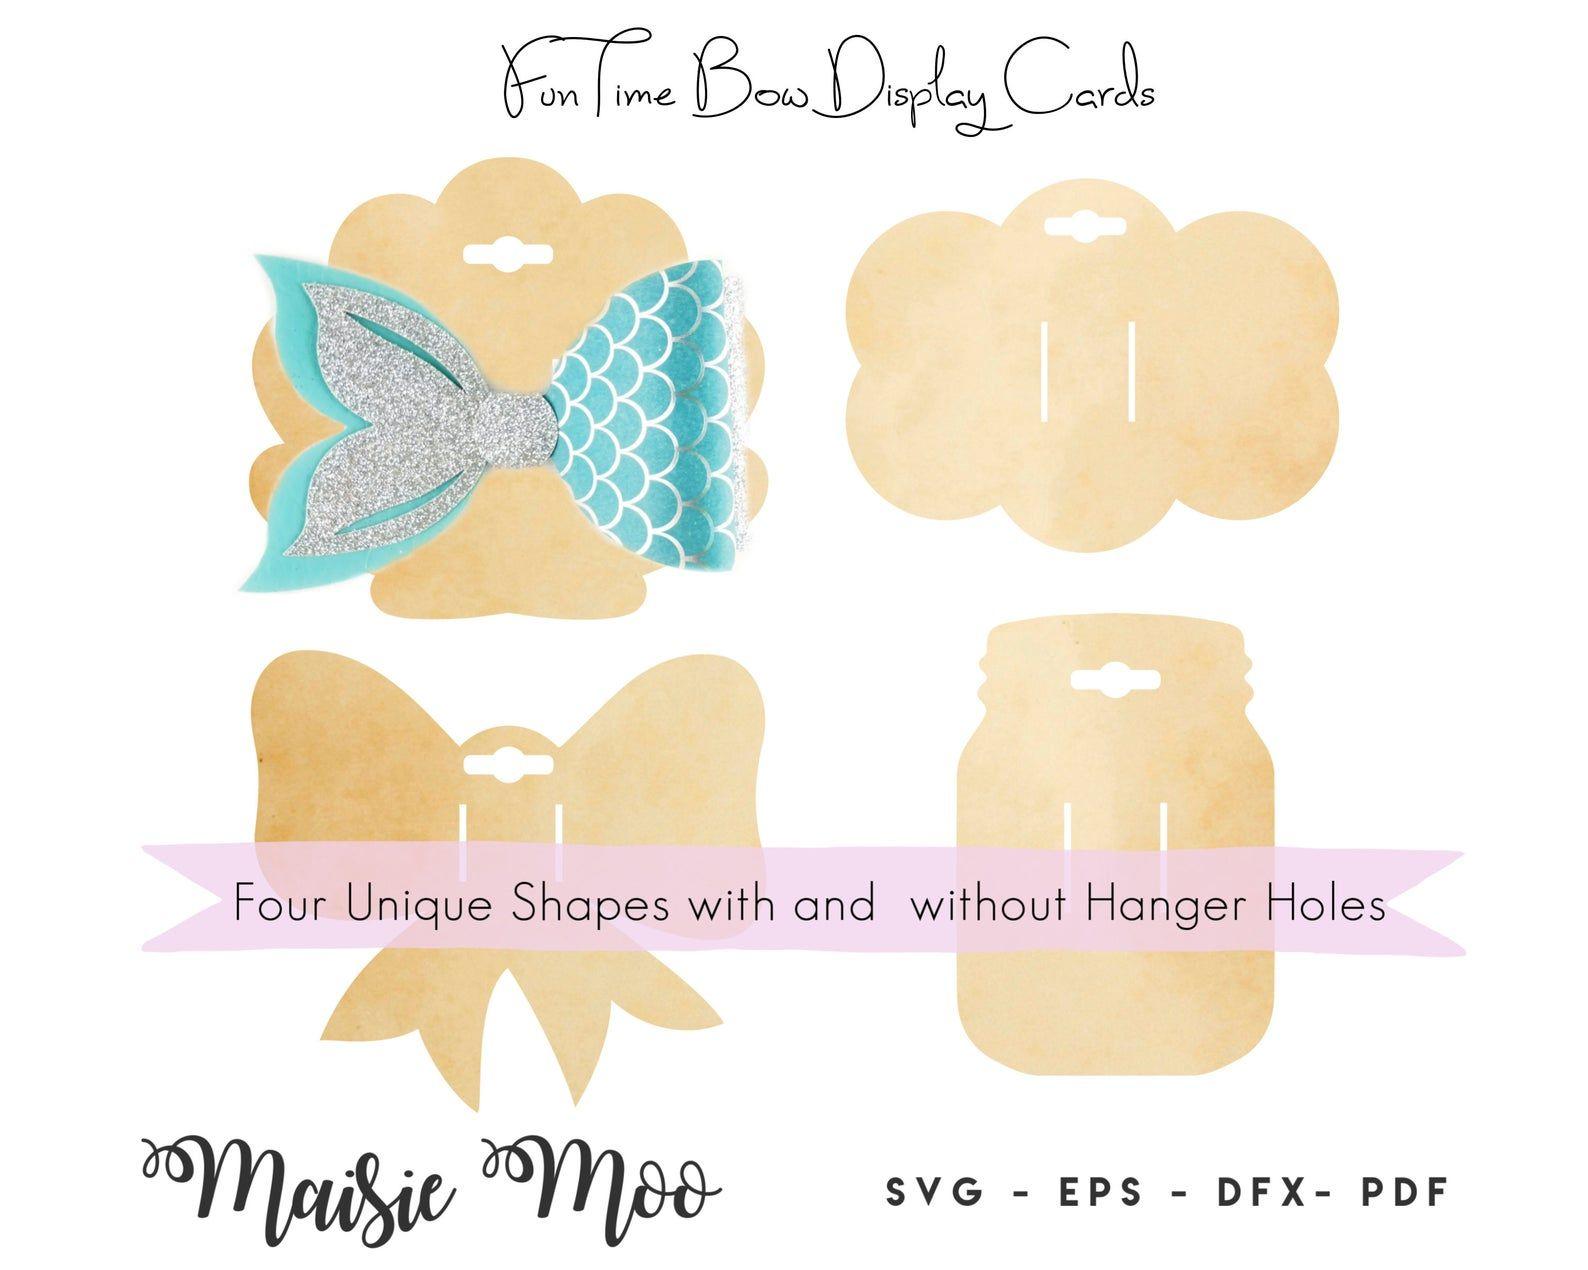 Bow Card Svg Mason Jar Bow Display Card Hair Clip Card Dxf Etsy In 2021 Bow Display Display Cards Hair Bow Display